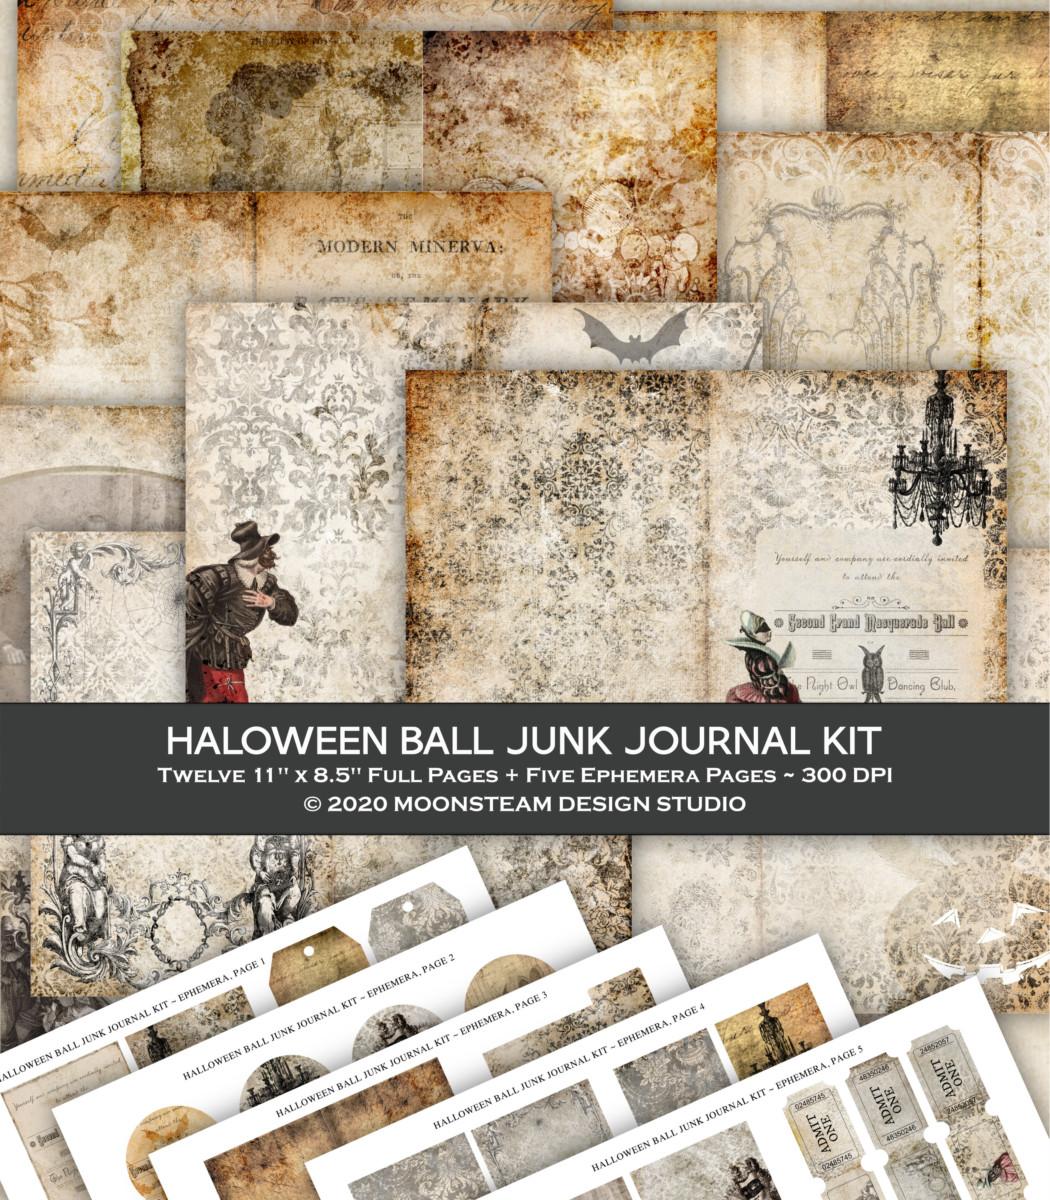 Halloween Ball Junk Journal Kit by Moonsteam Design Studio